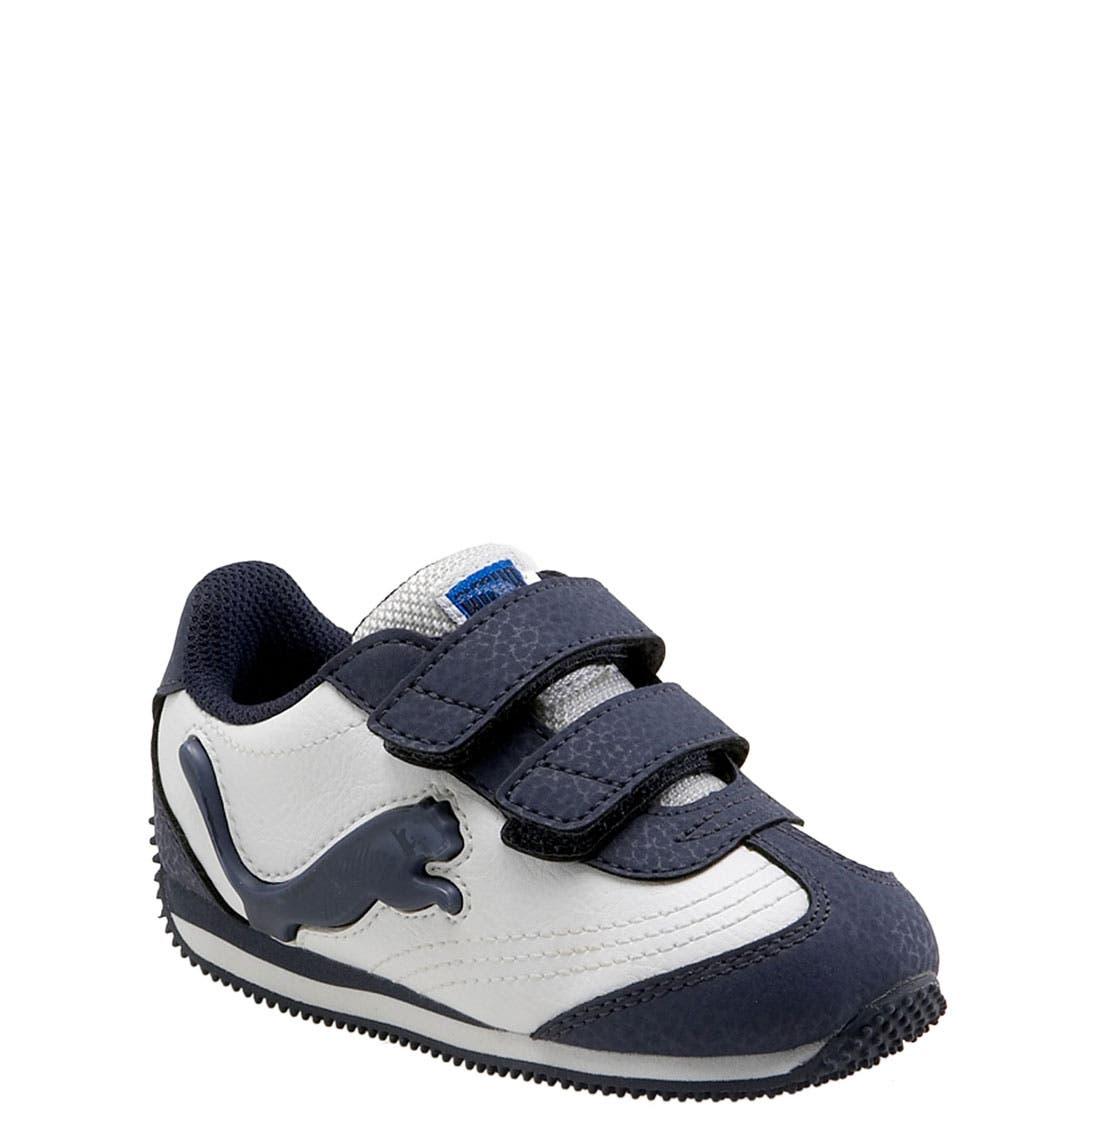 Alternate Image 1 Selected - PUMA 'Speeder Illuminescent' Sneaker (Baby, Walker & Toddler)